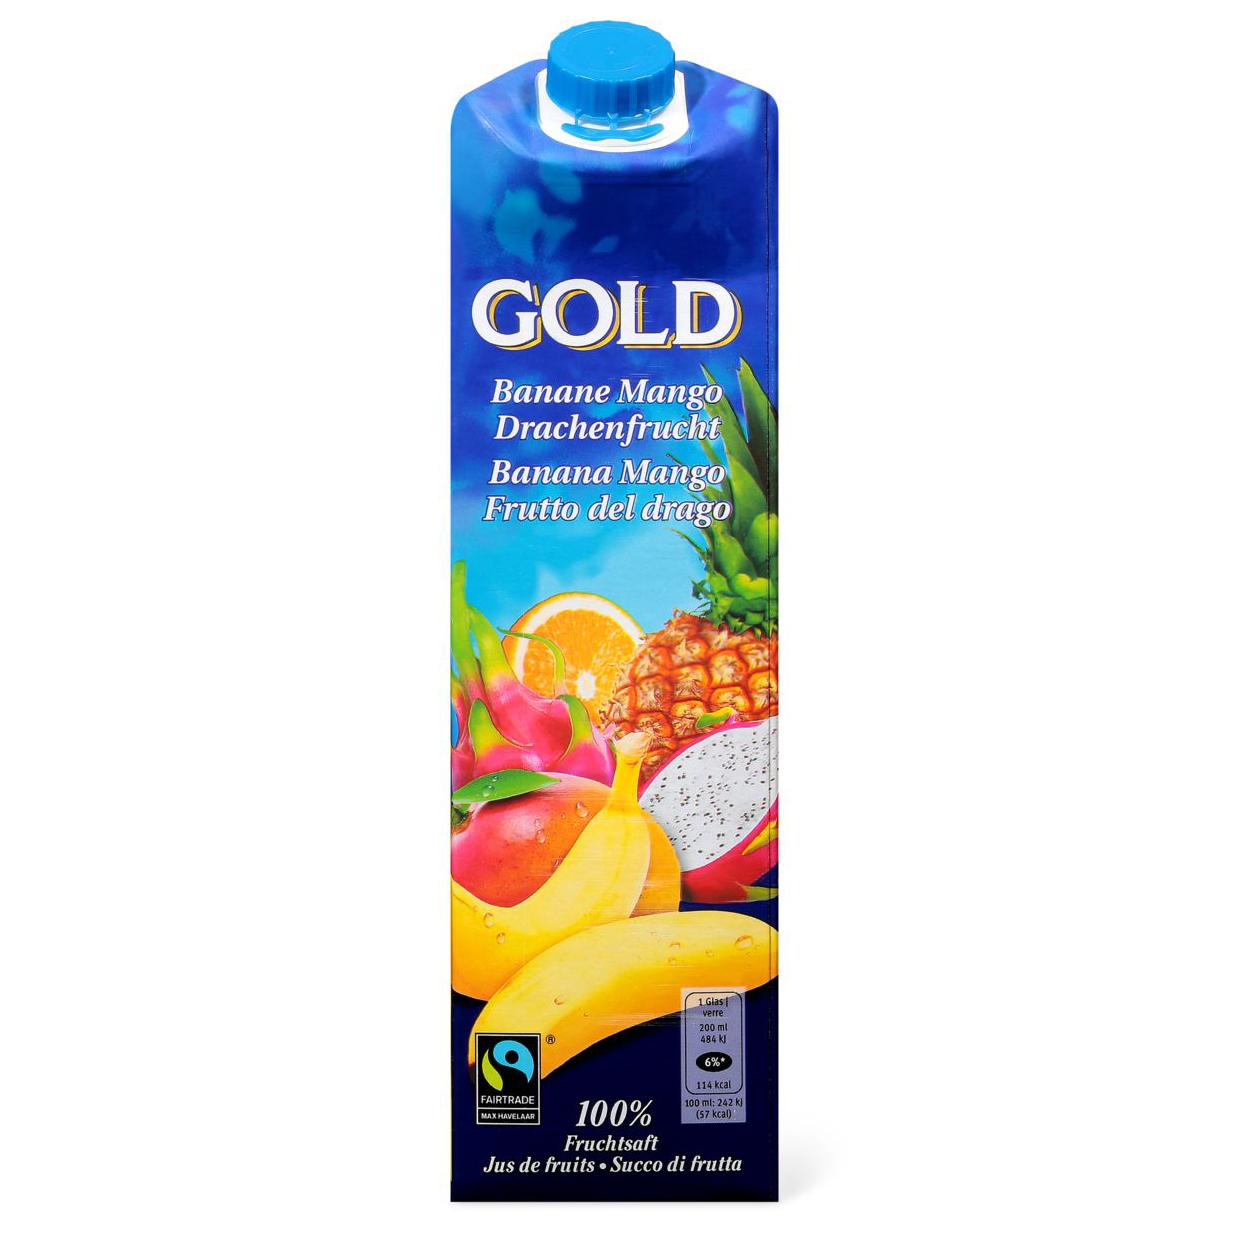 Banane-, Mango-, Drachenfruchtsaft